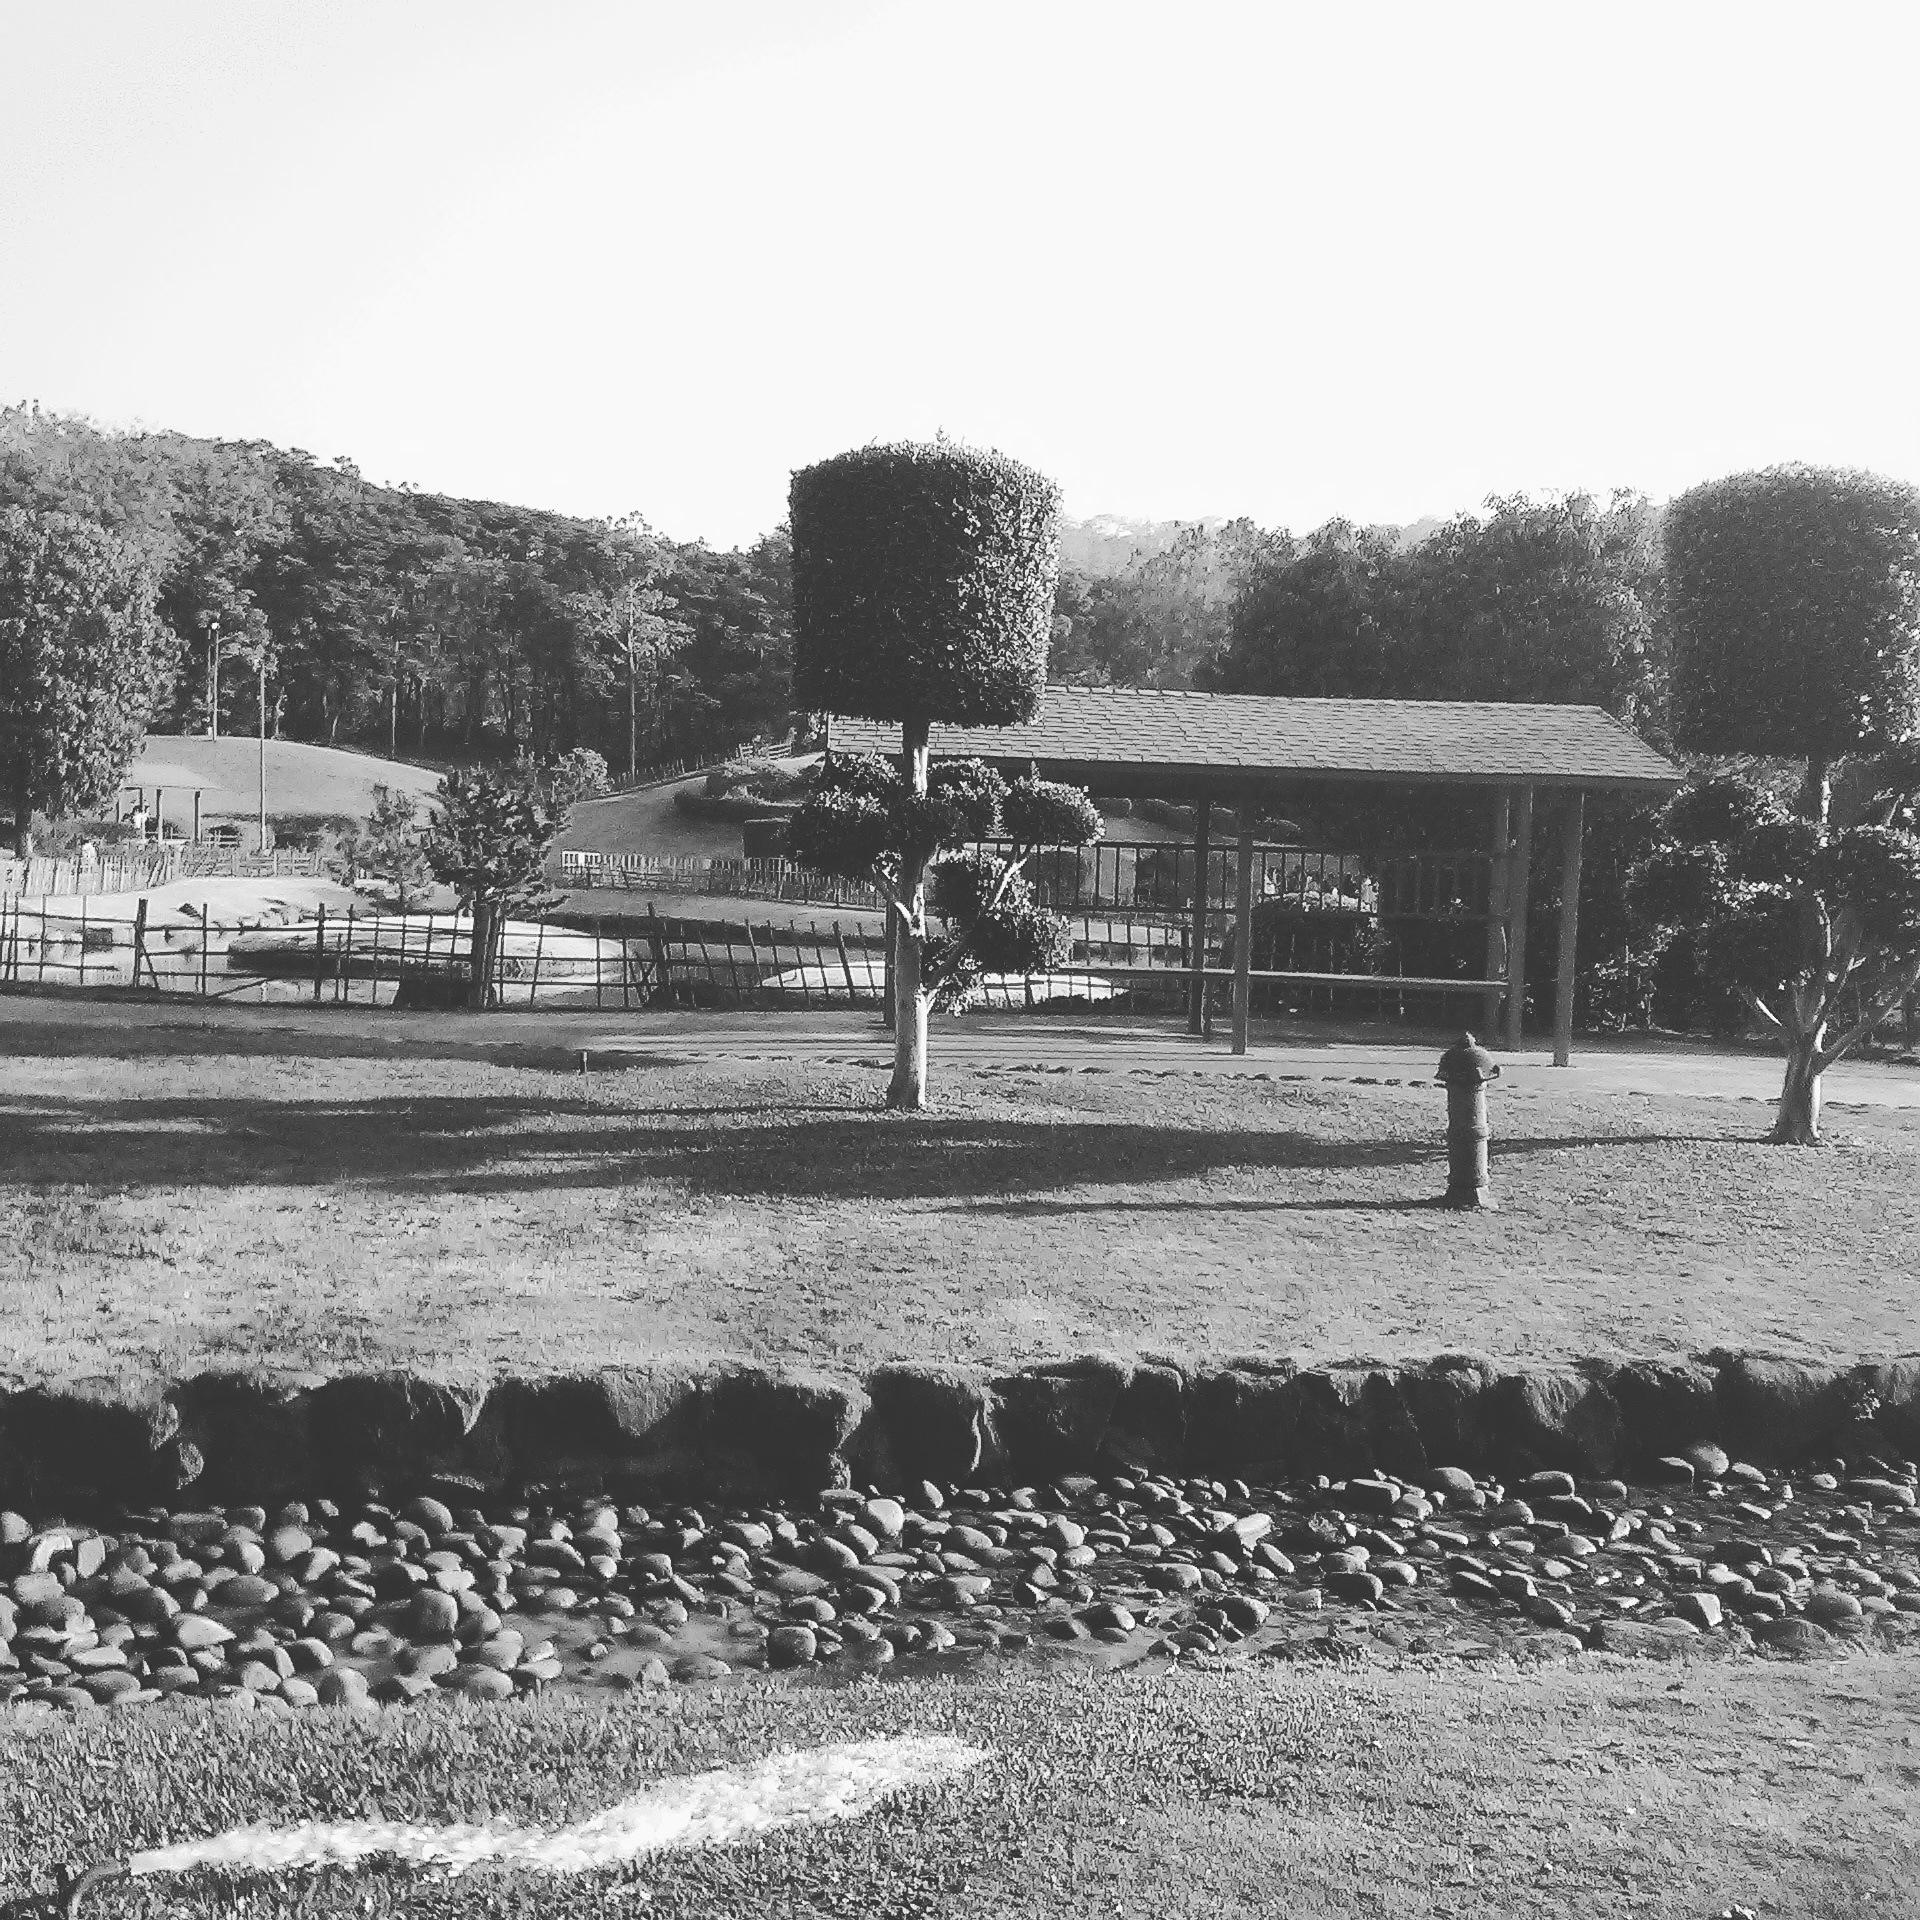 Black and White photo by Chitralekha